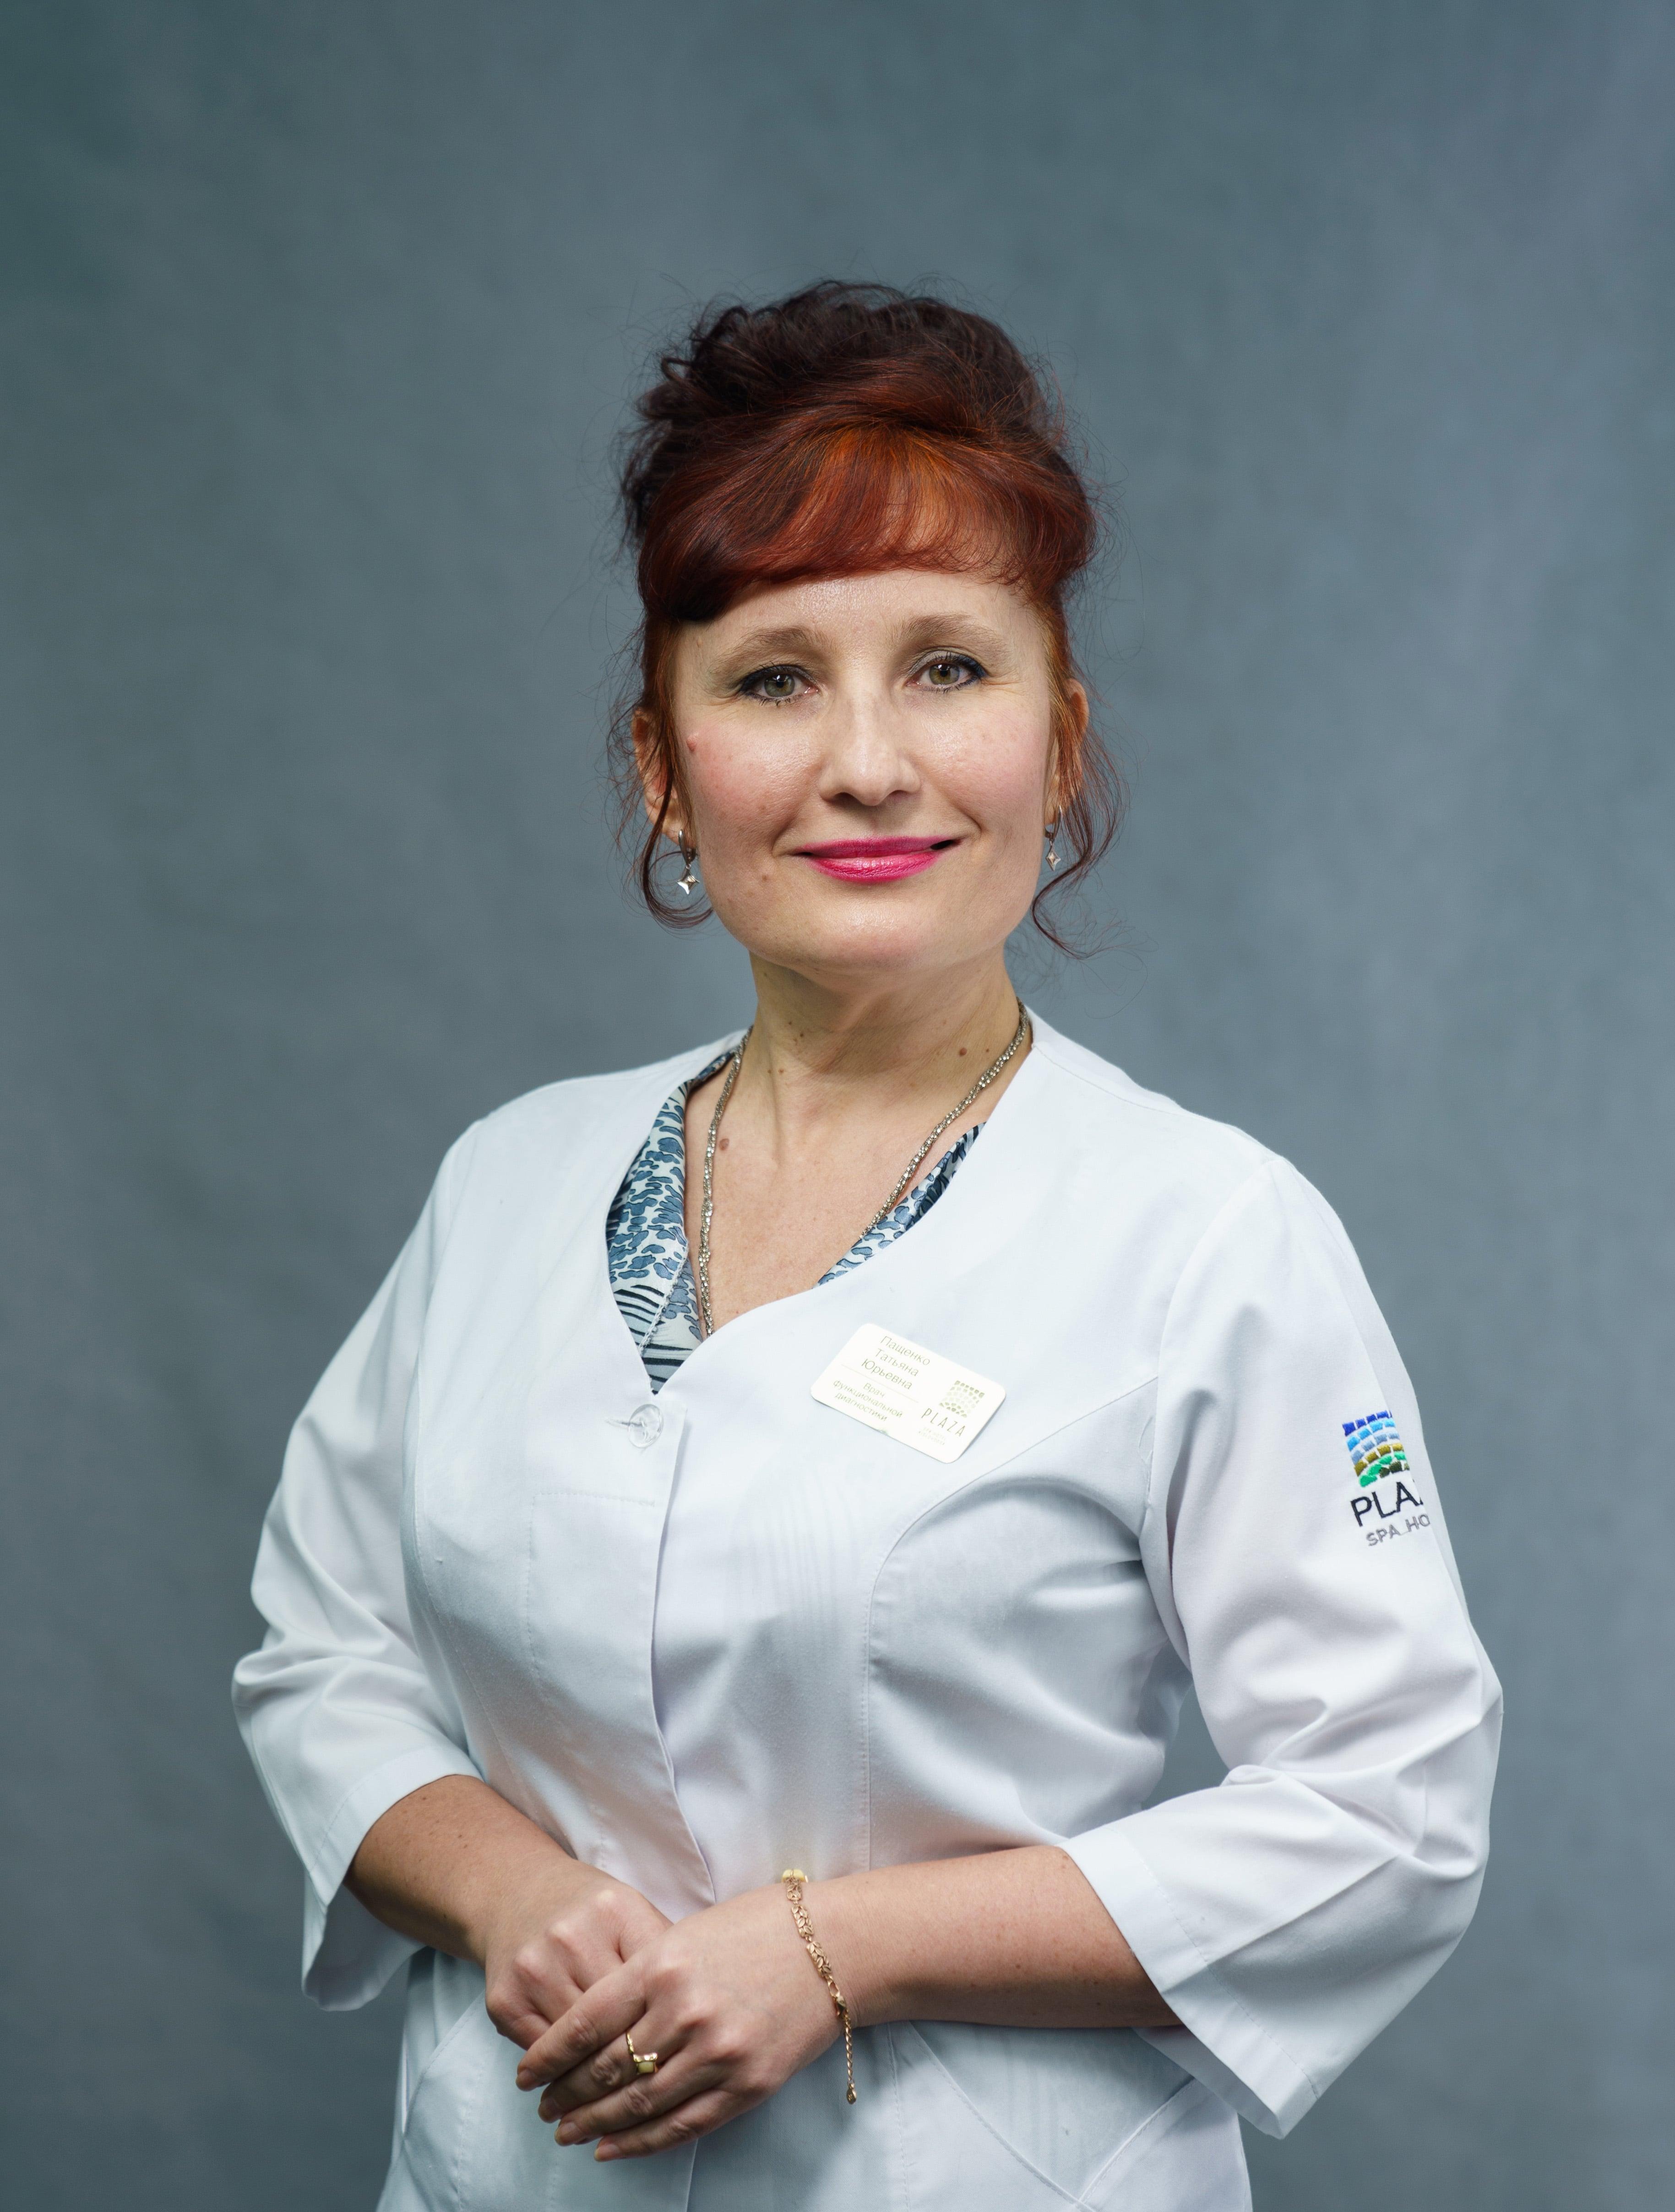 Пащенко Татьяна Юрьевна